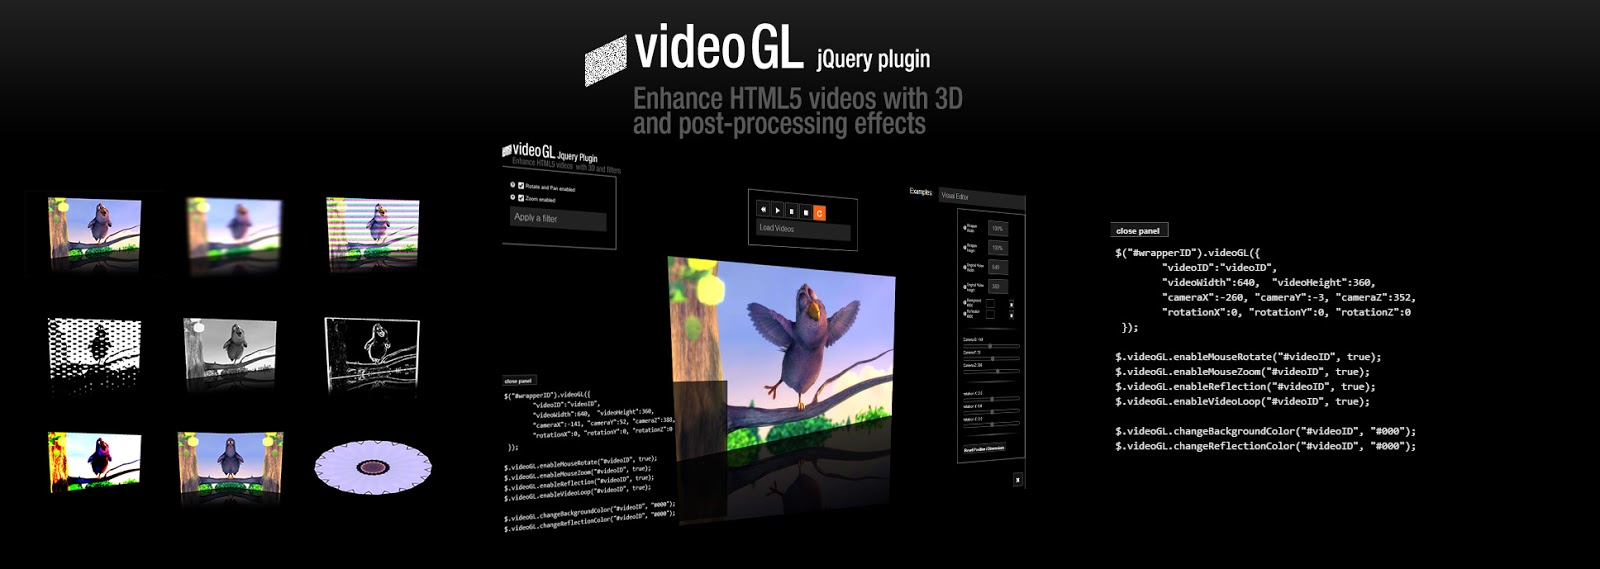 VideoGL